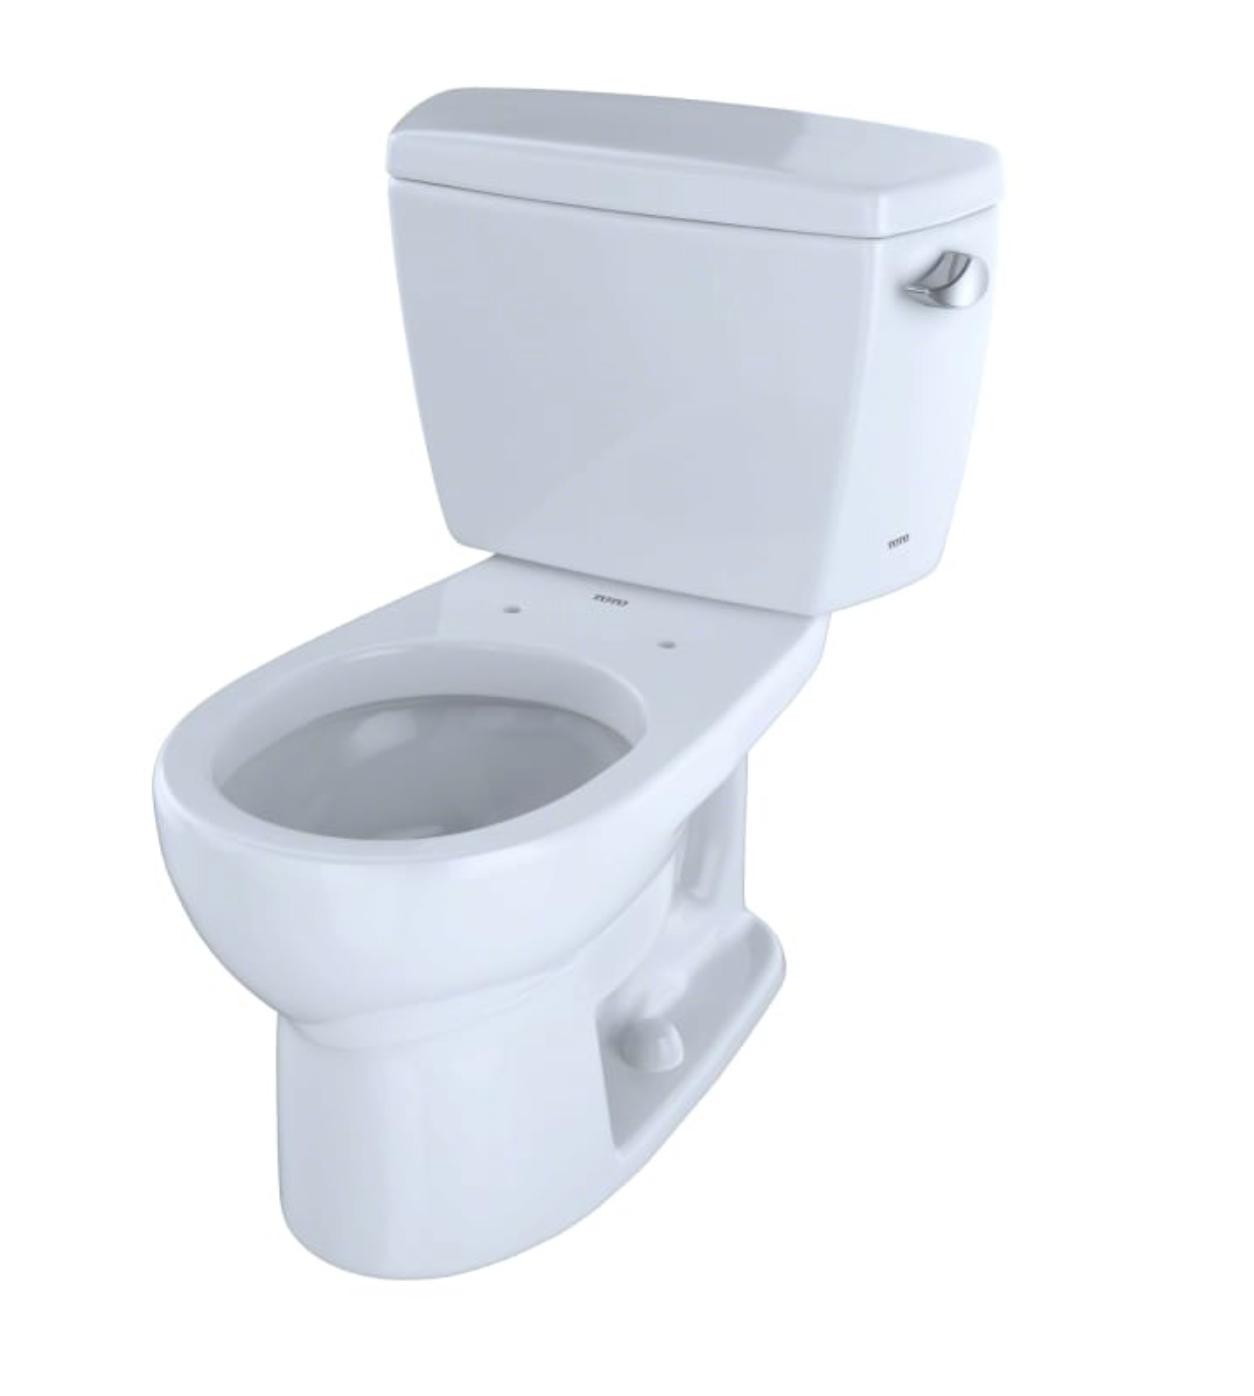 6. Toilet - Toto:The Drake at Build.com